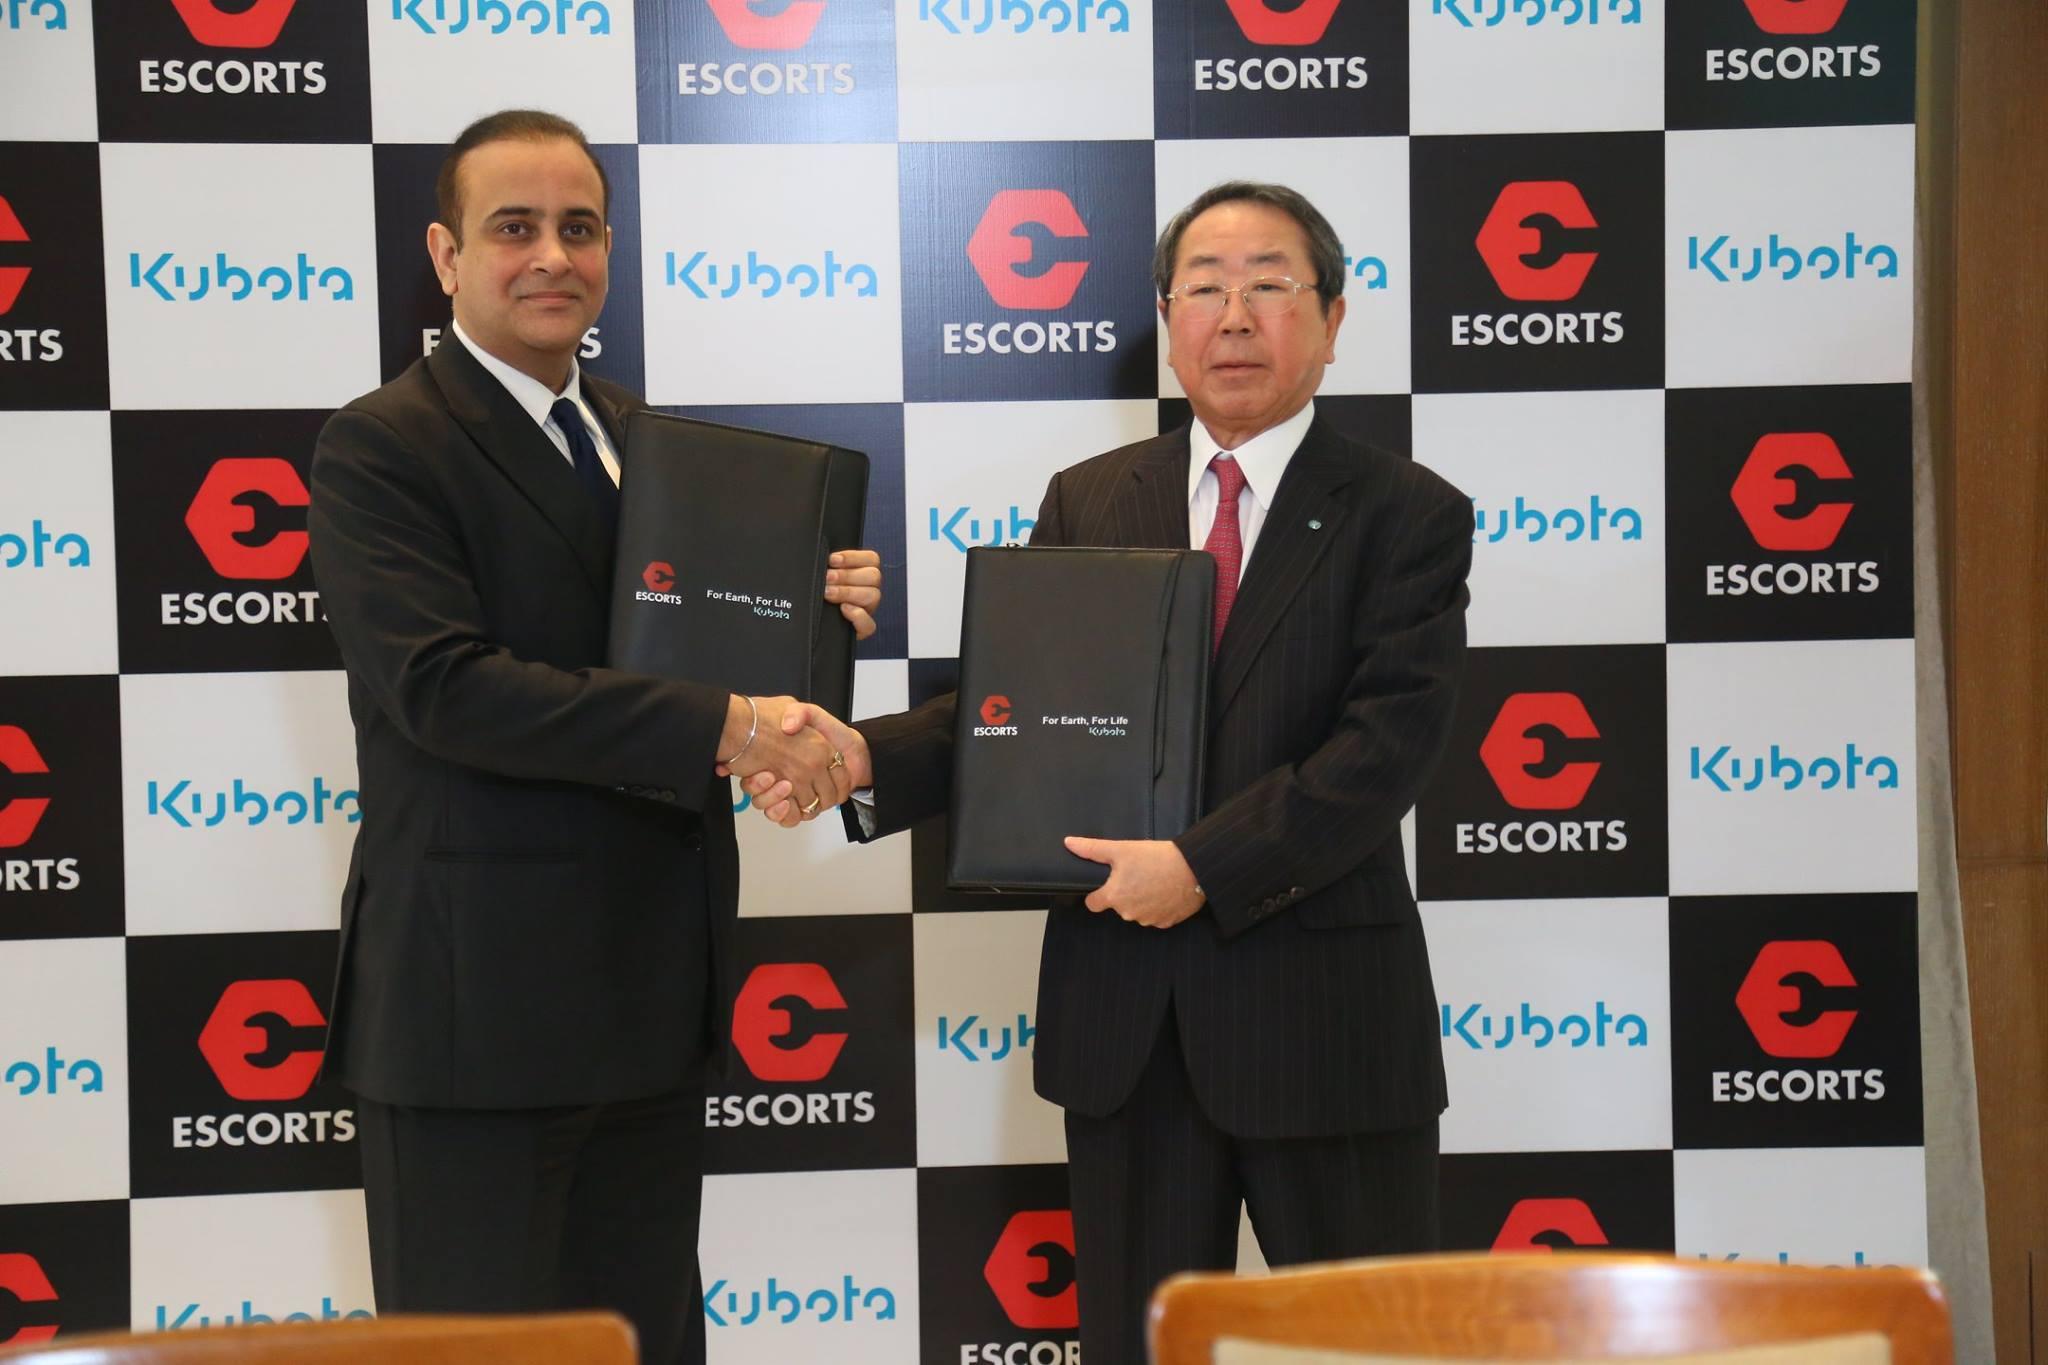 Kubota e Escorts: una joint-venture che punta in alto